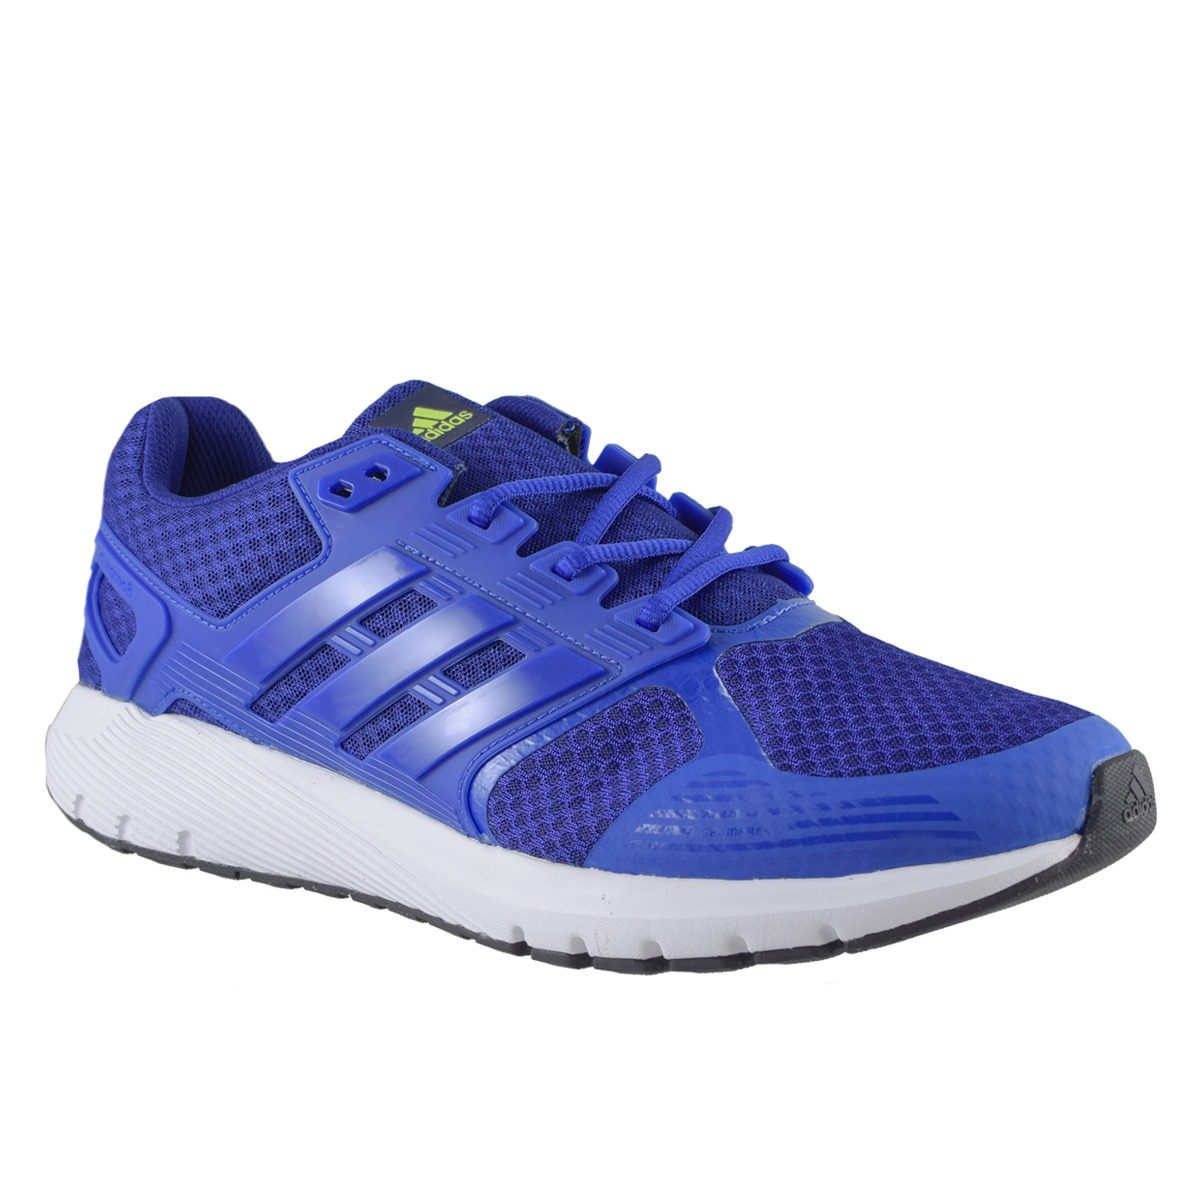 ecd39ef4282 Zapatillas adidas Duramo 8 Hombre Azul -   1.800